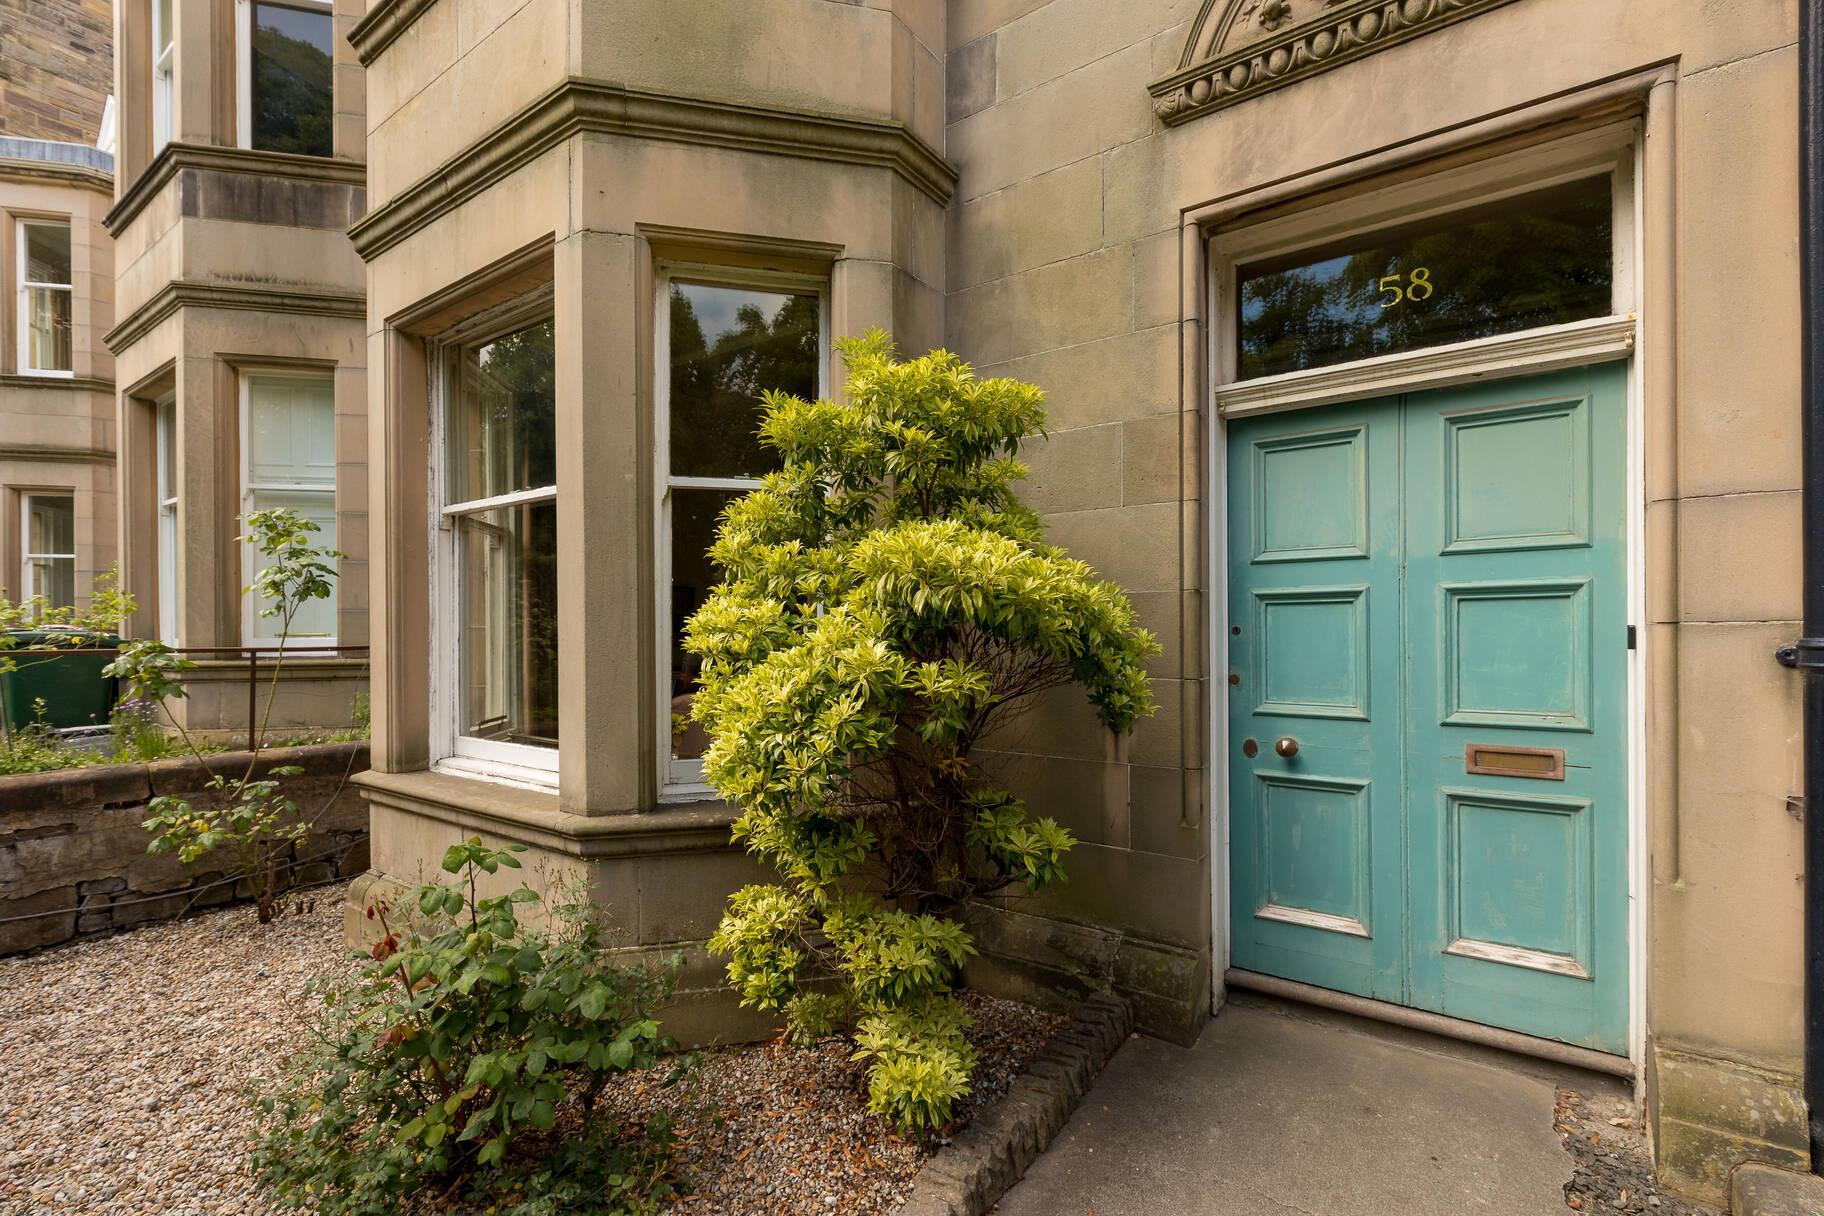 58 Braid Road, Morningside, Edinburgh, EH10 6AL